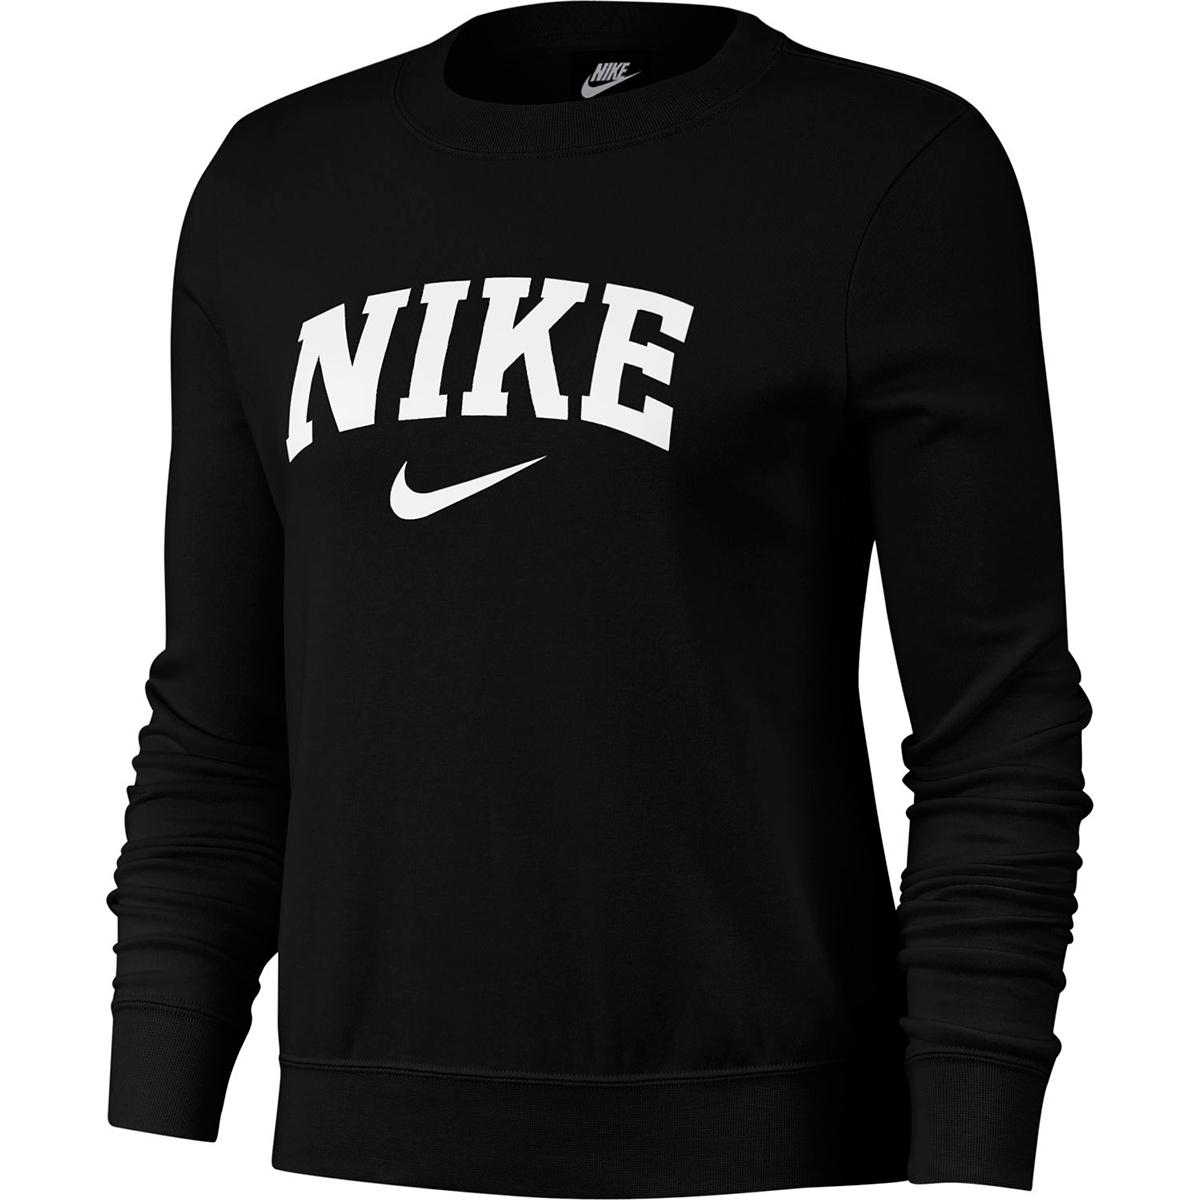 Nike Women's Nike Swoosh Fleece Crewneck Sweatshirt - Black, L